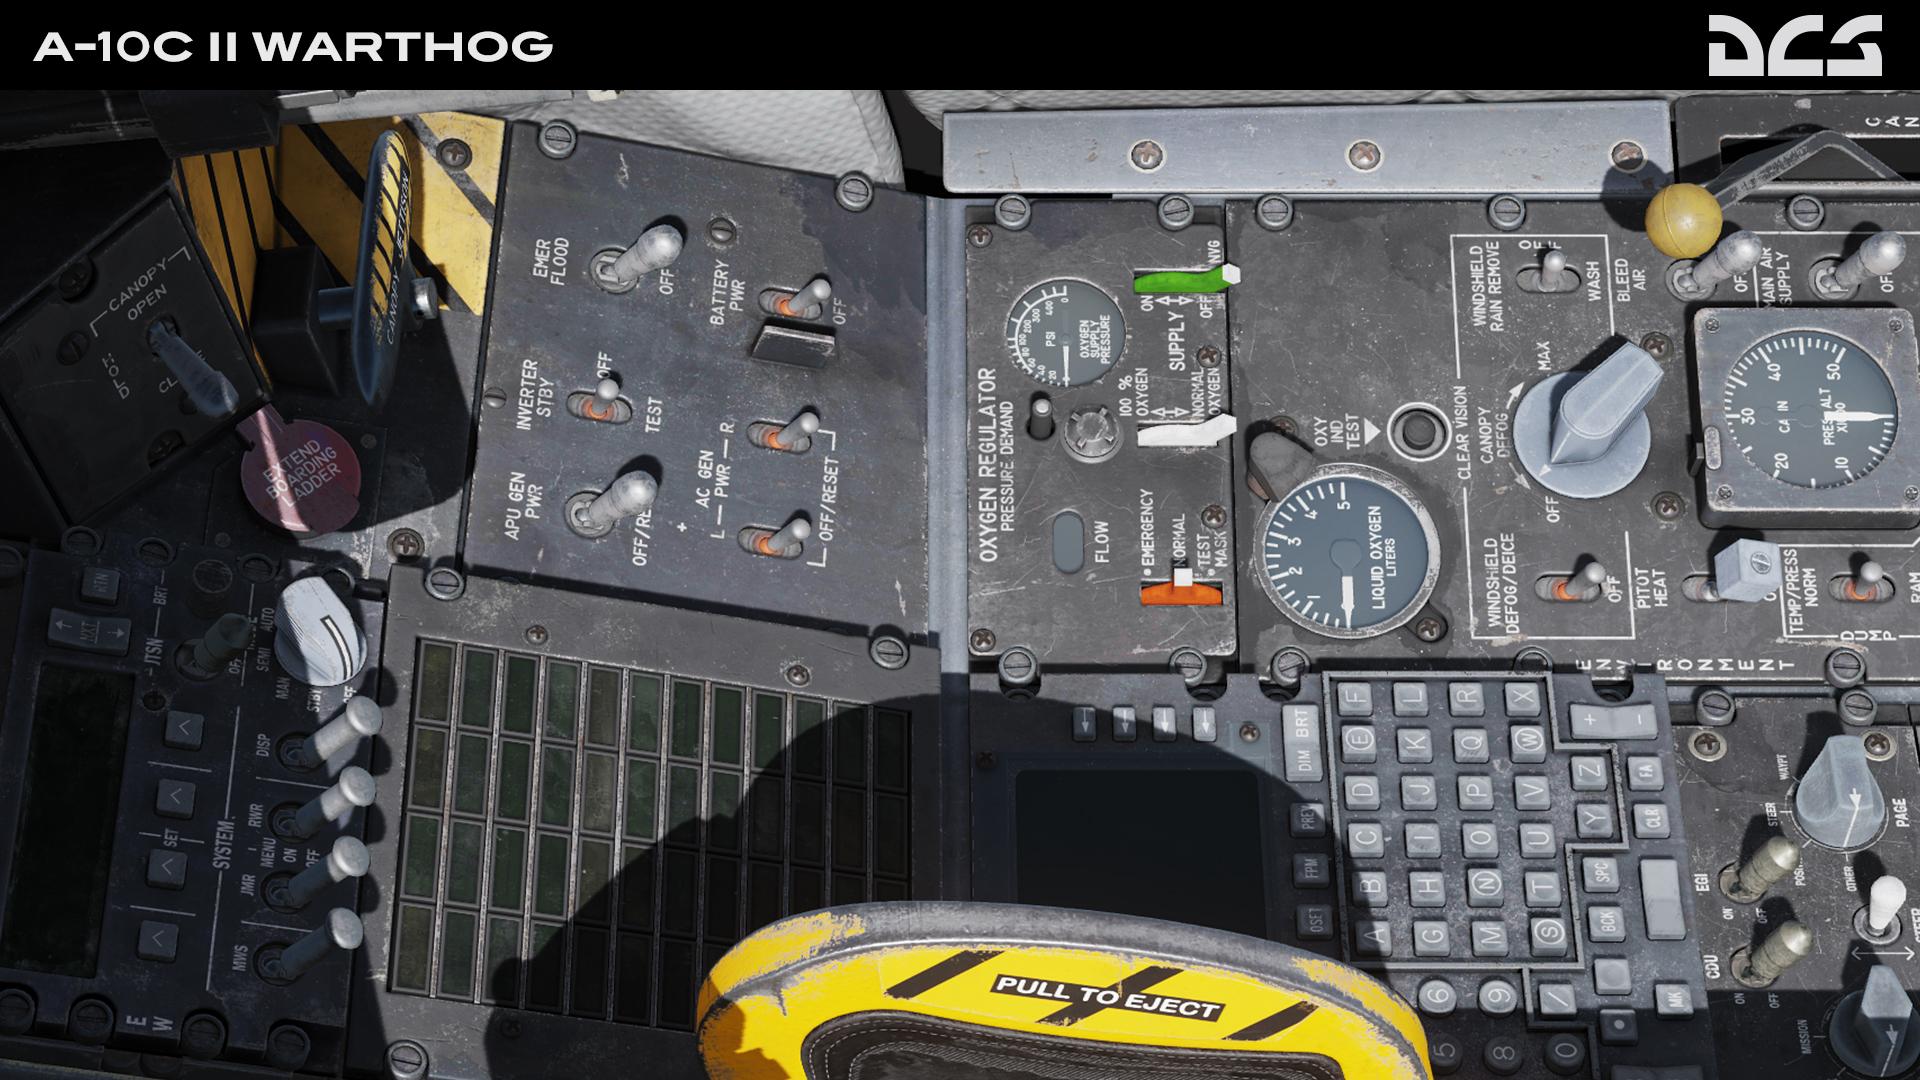 www.digitalcombatsimulator.com/upload/iblock/e75/dcs-world-a-10c-ii-05-flight-simulator.jpg